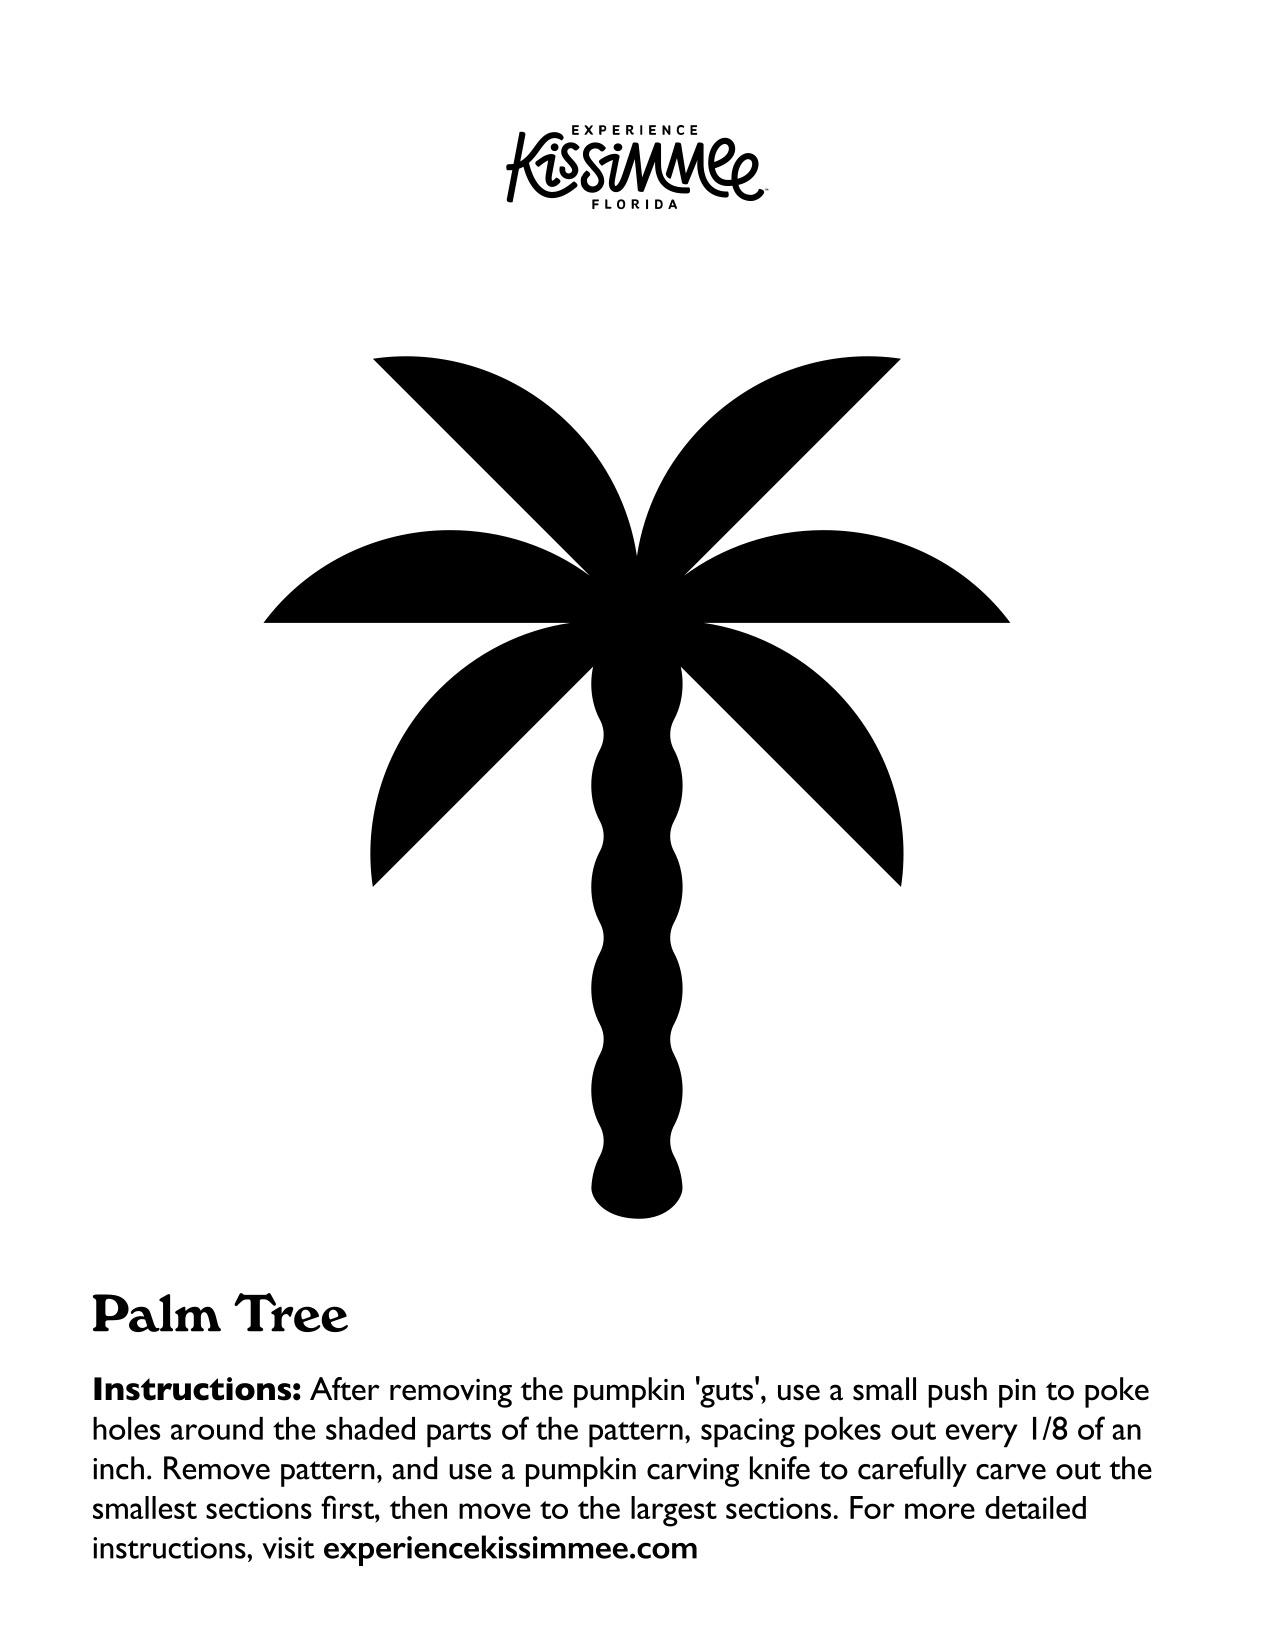 Palm Tree Jack-O-Lantern Template